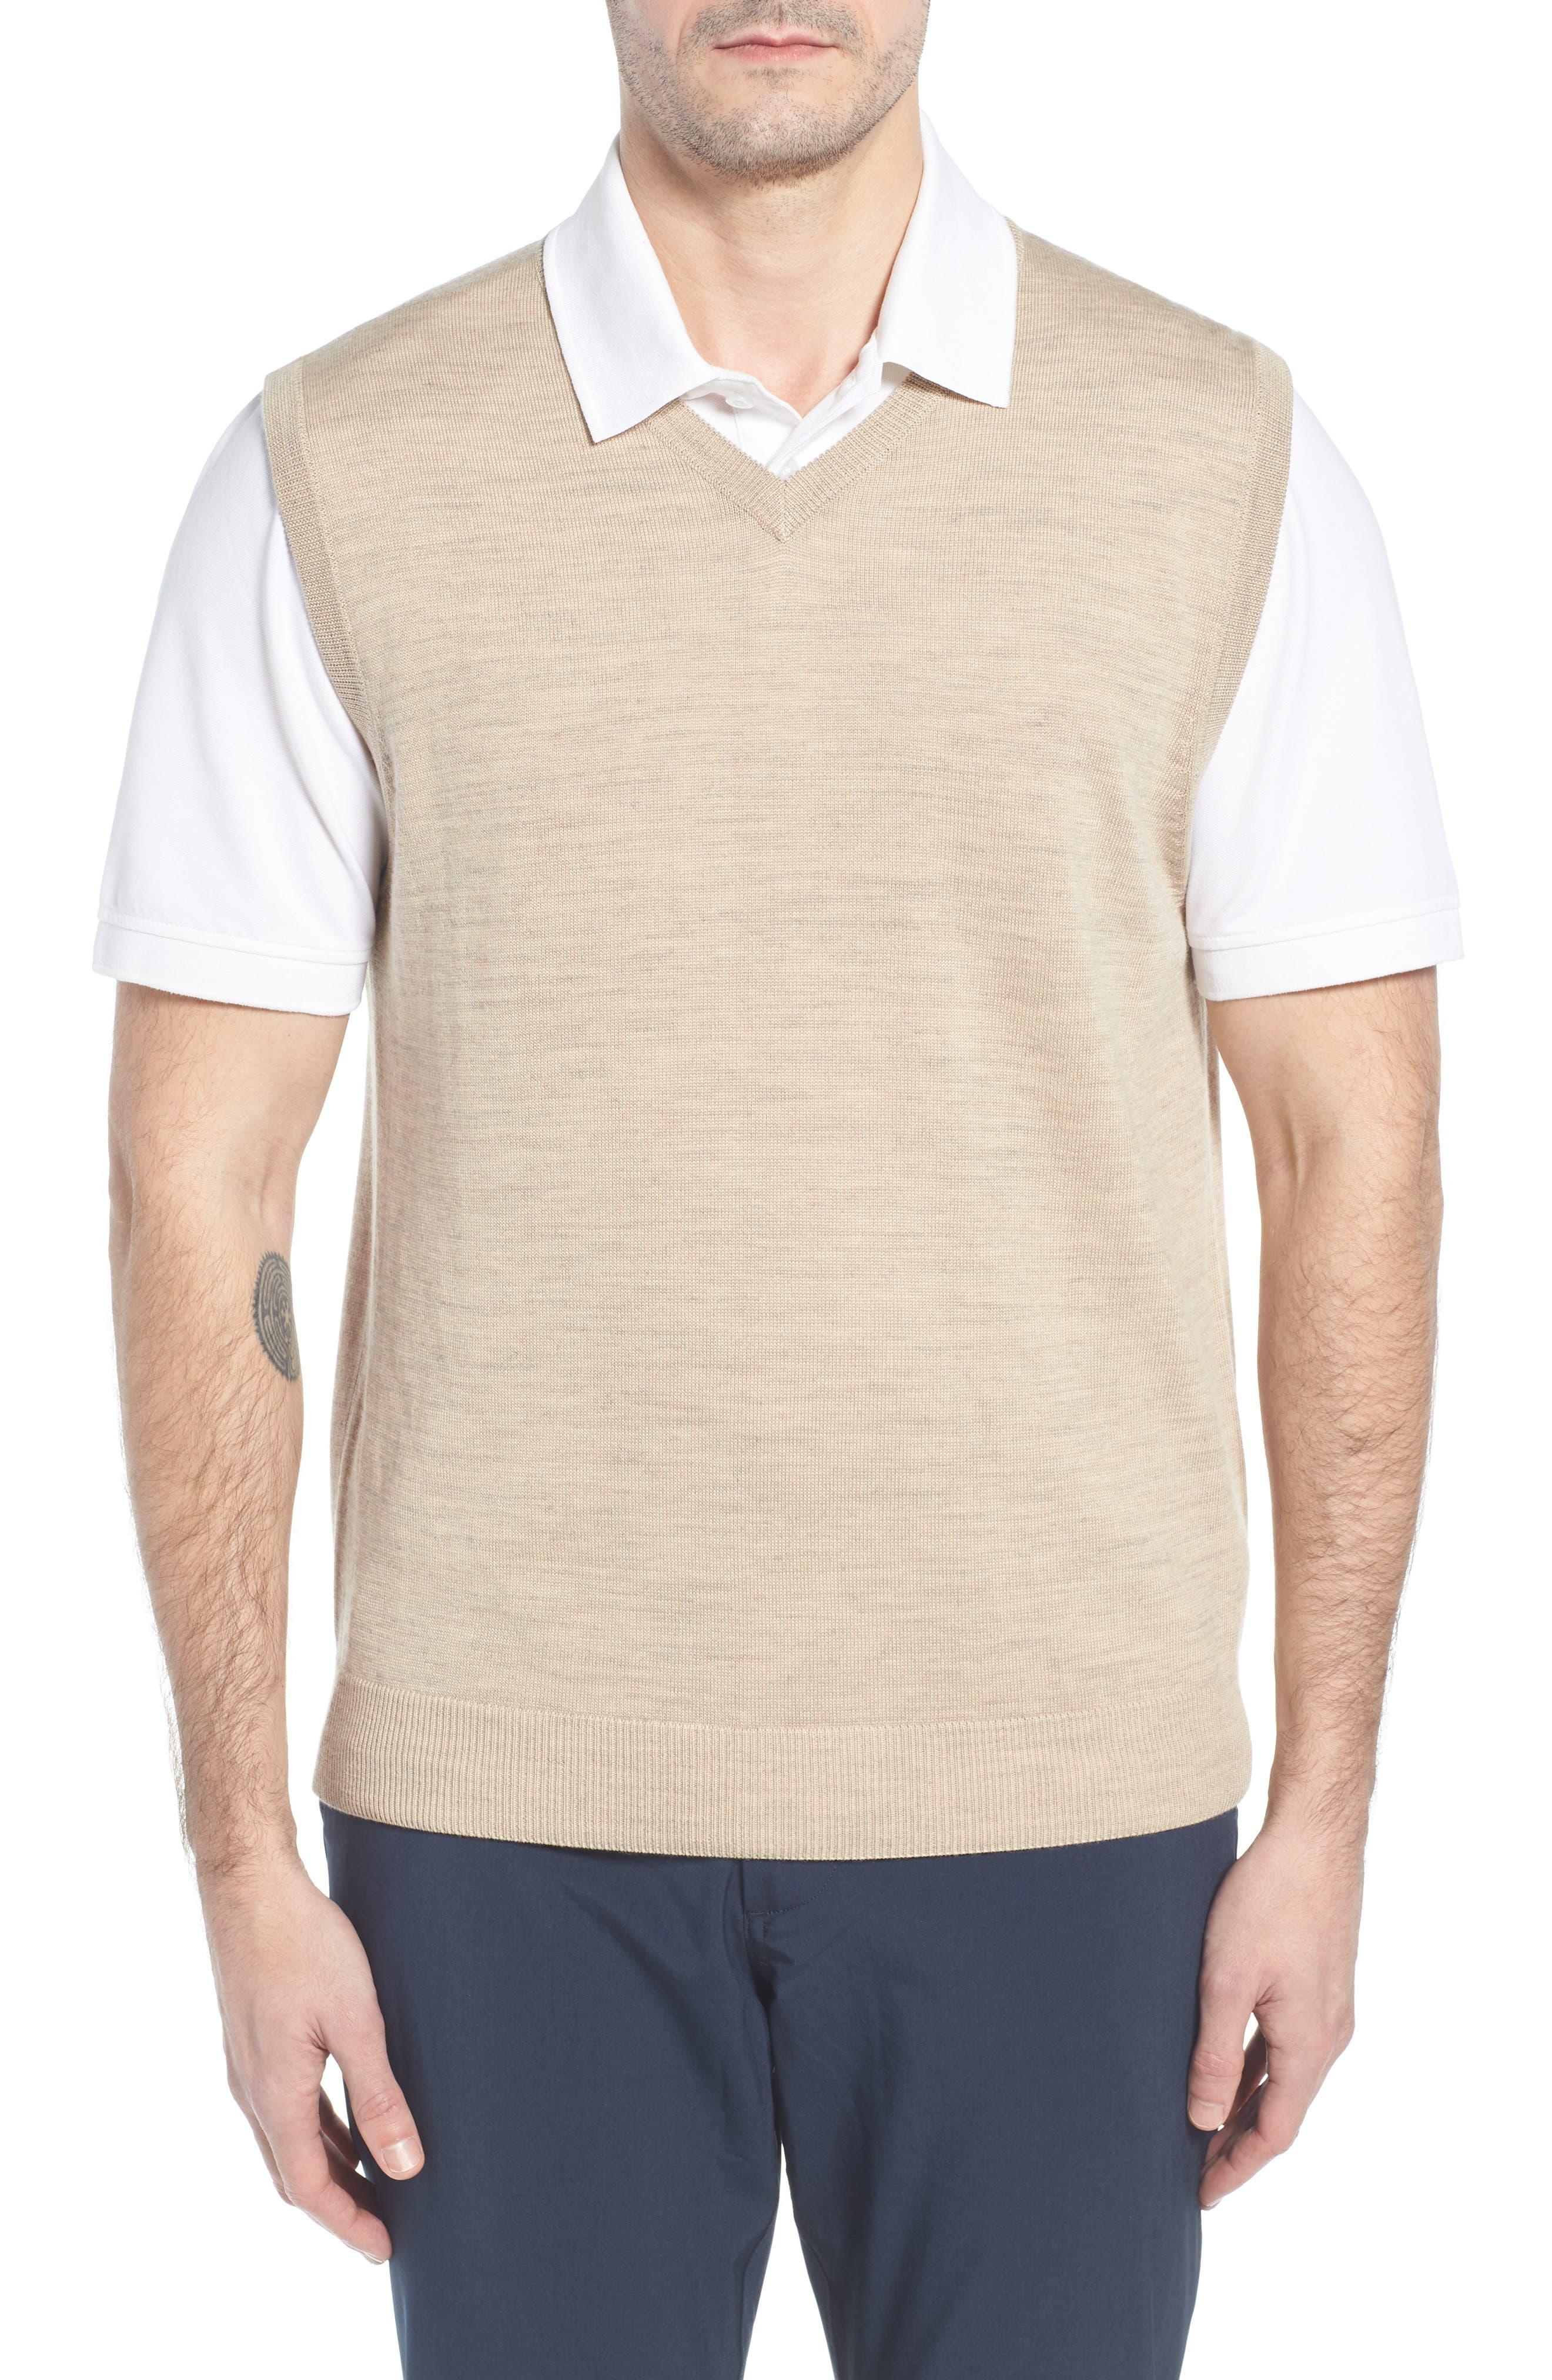 CUTTER & BUCK 'Douglas' Merino Wool Blend V-Neck Sweater Vest, Main, color, SAND HEATHER